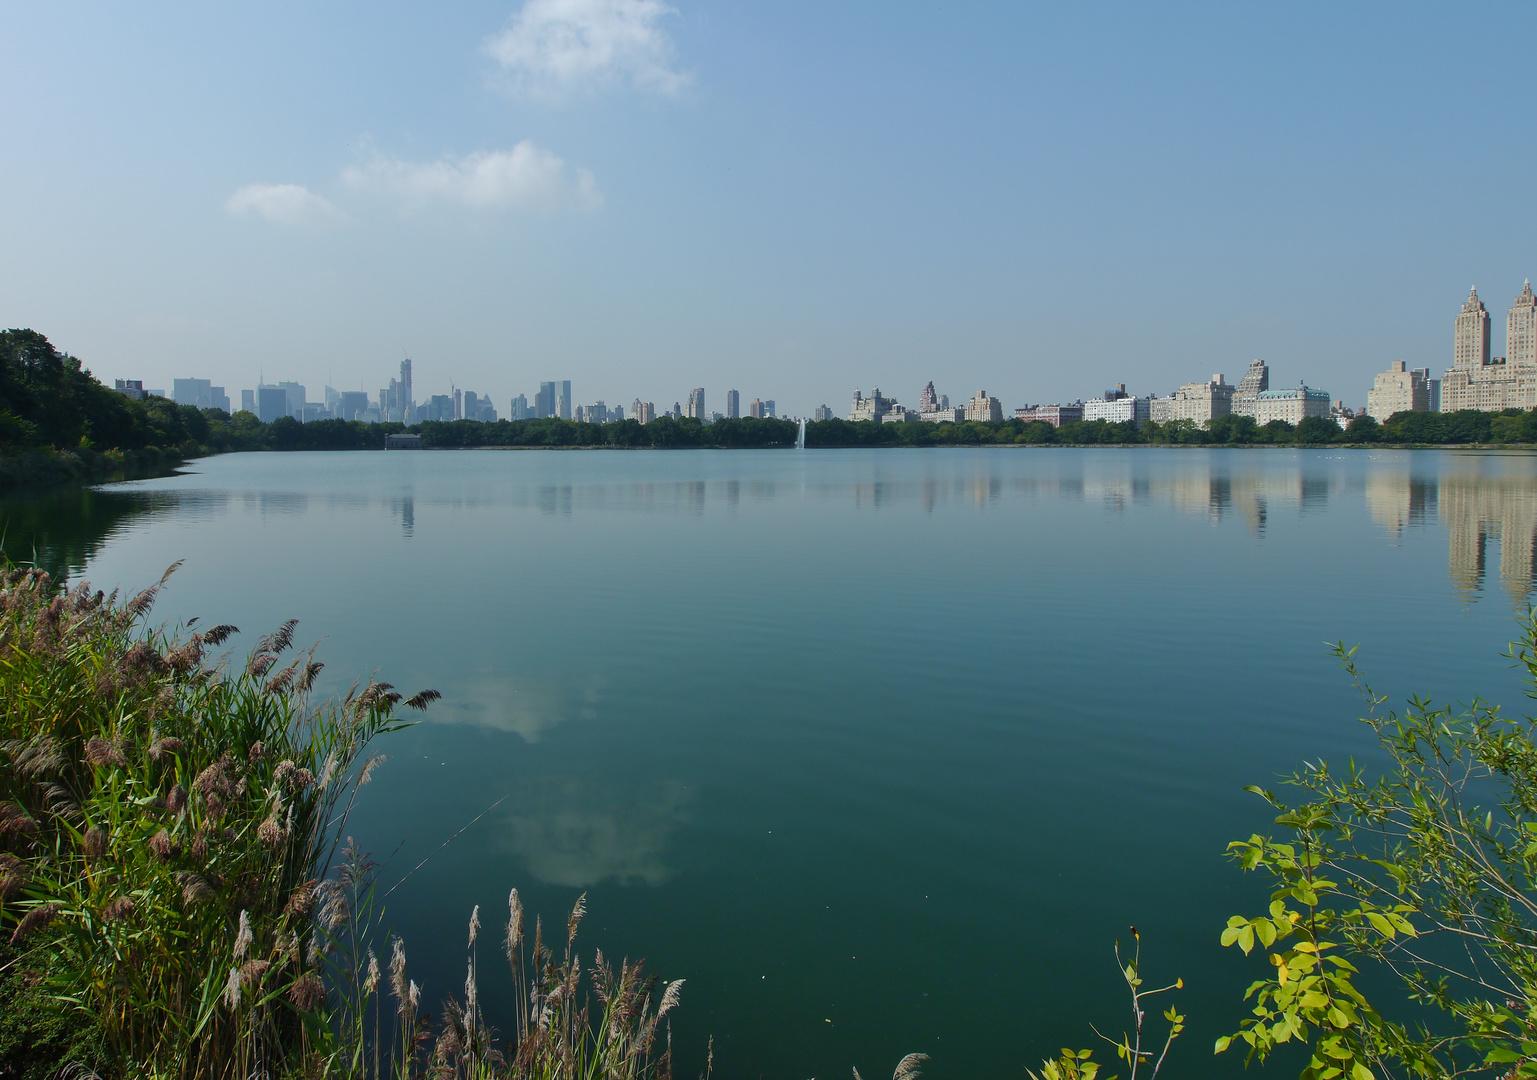 Jaqueline Kennedy Onassis Reservoir